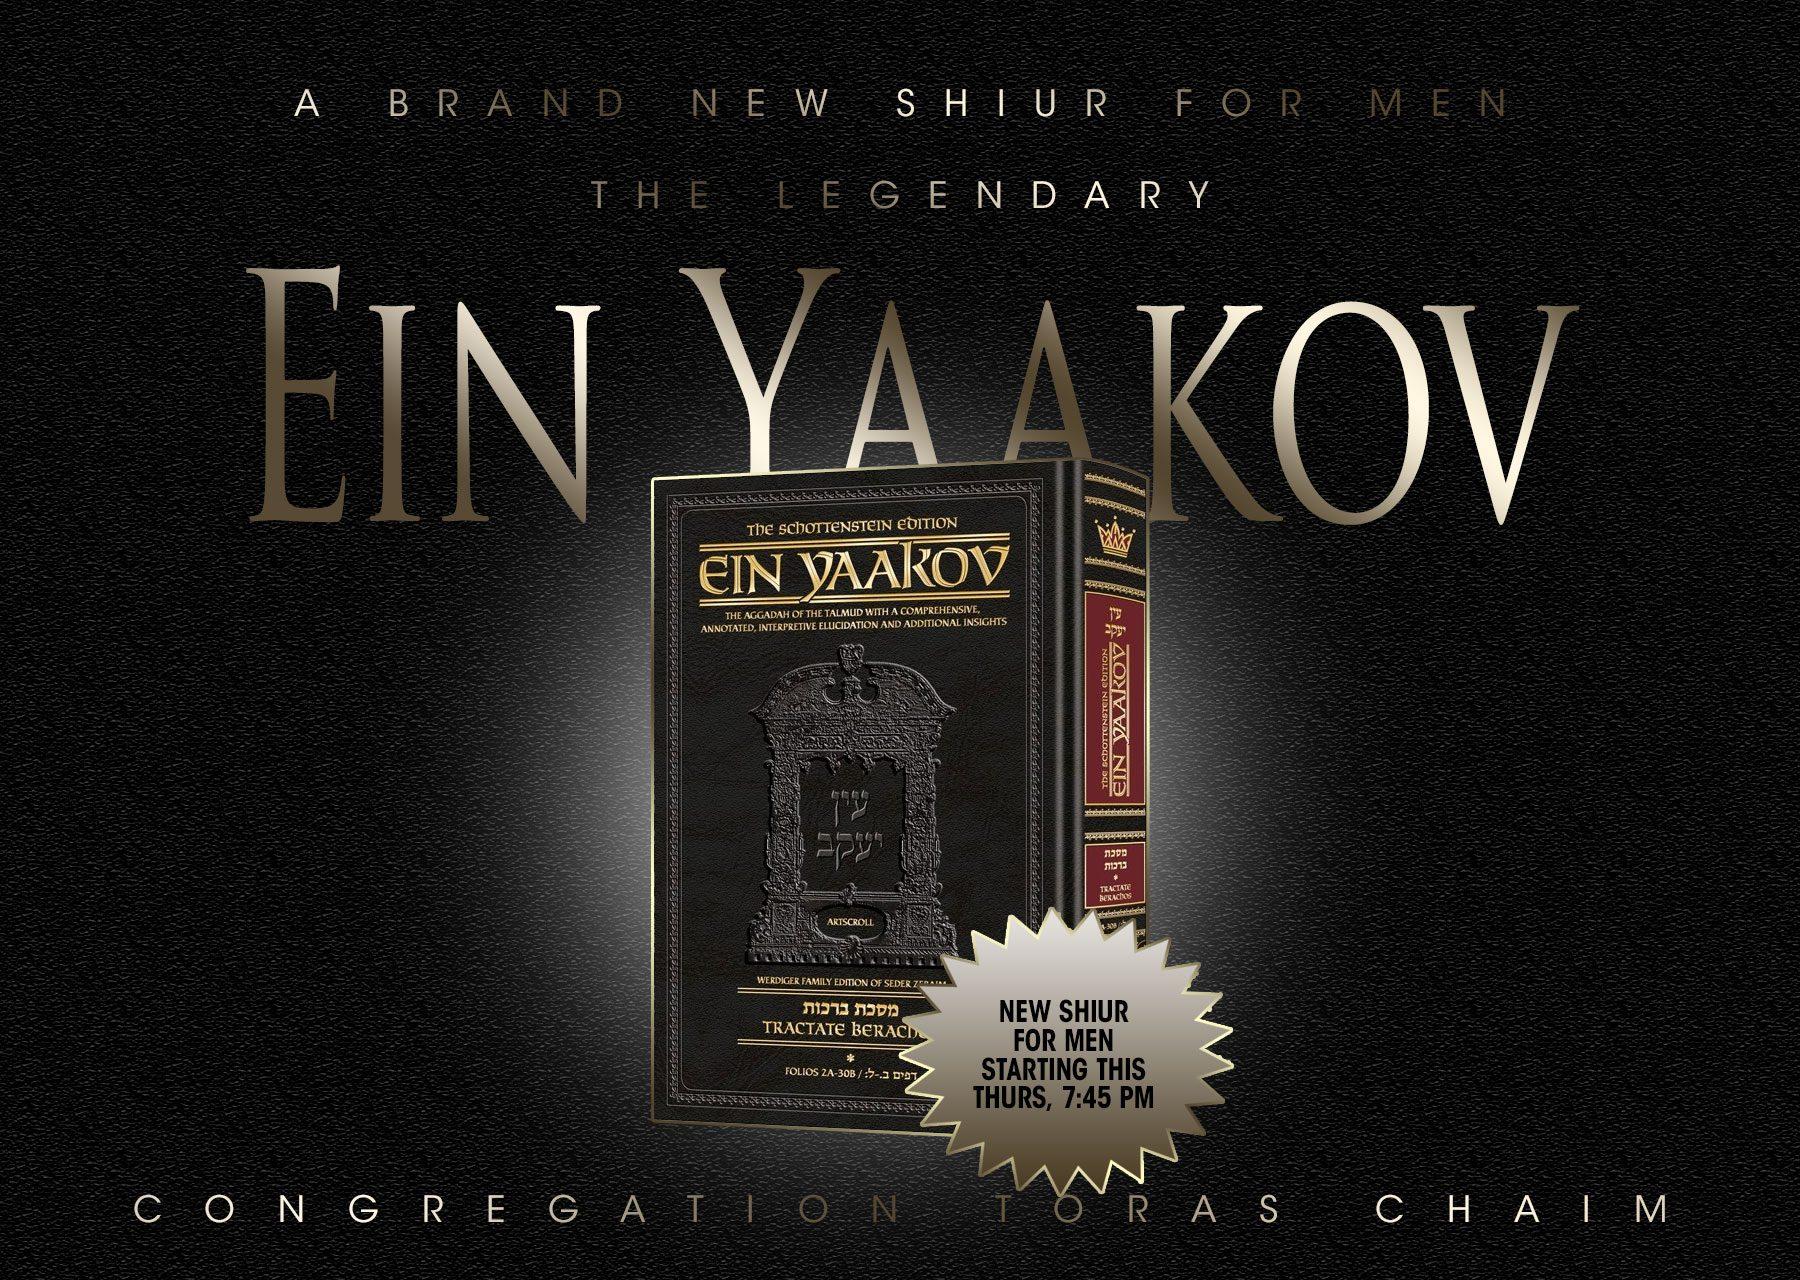 Study the Legendary Ein Yaakov